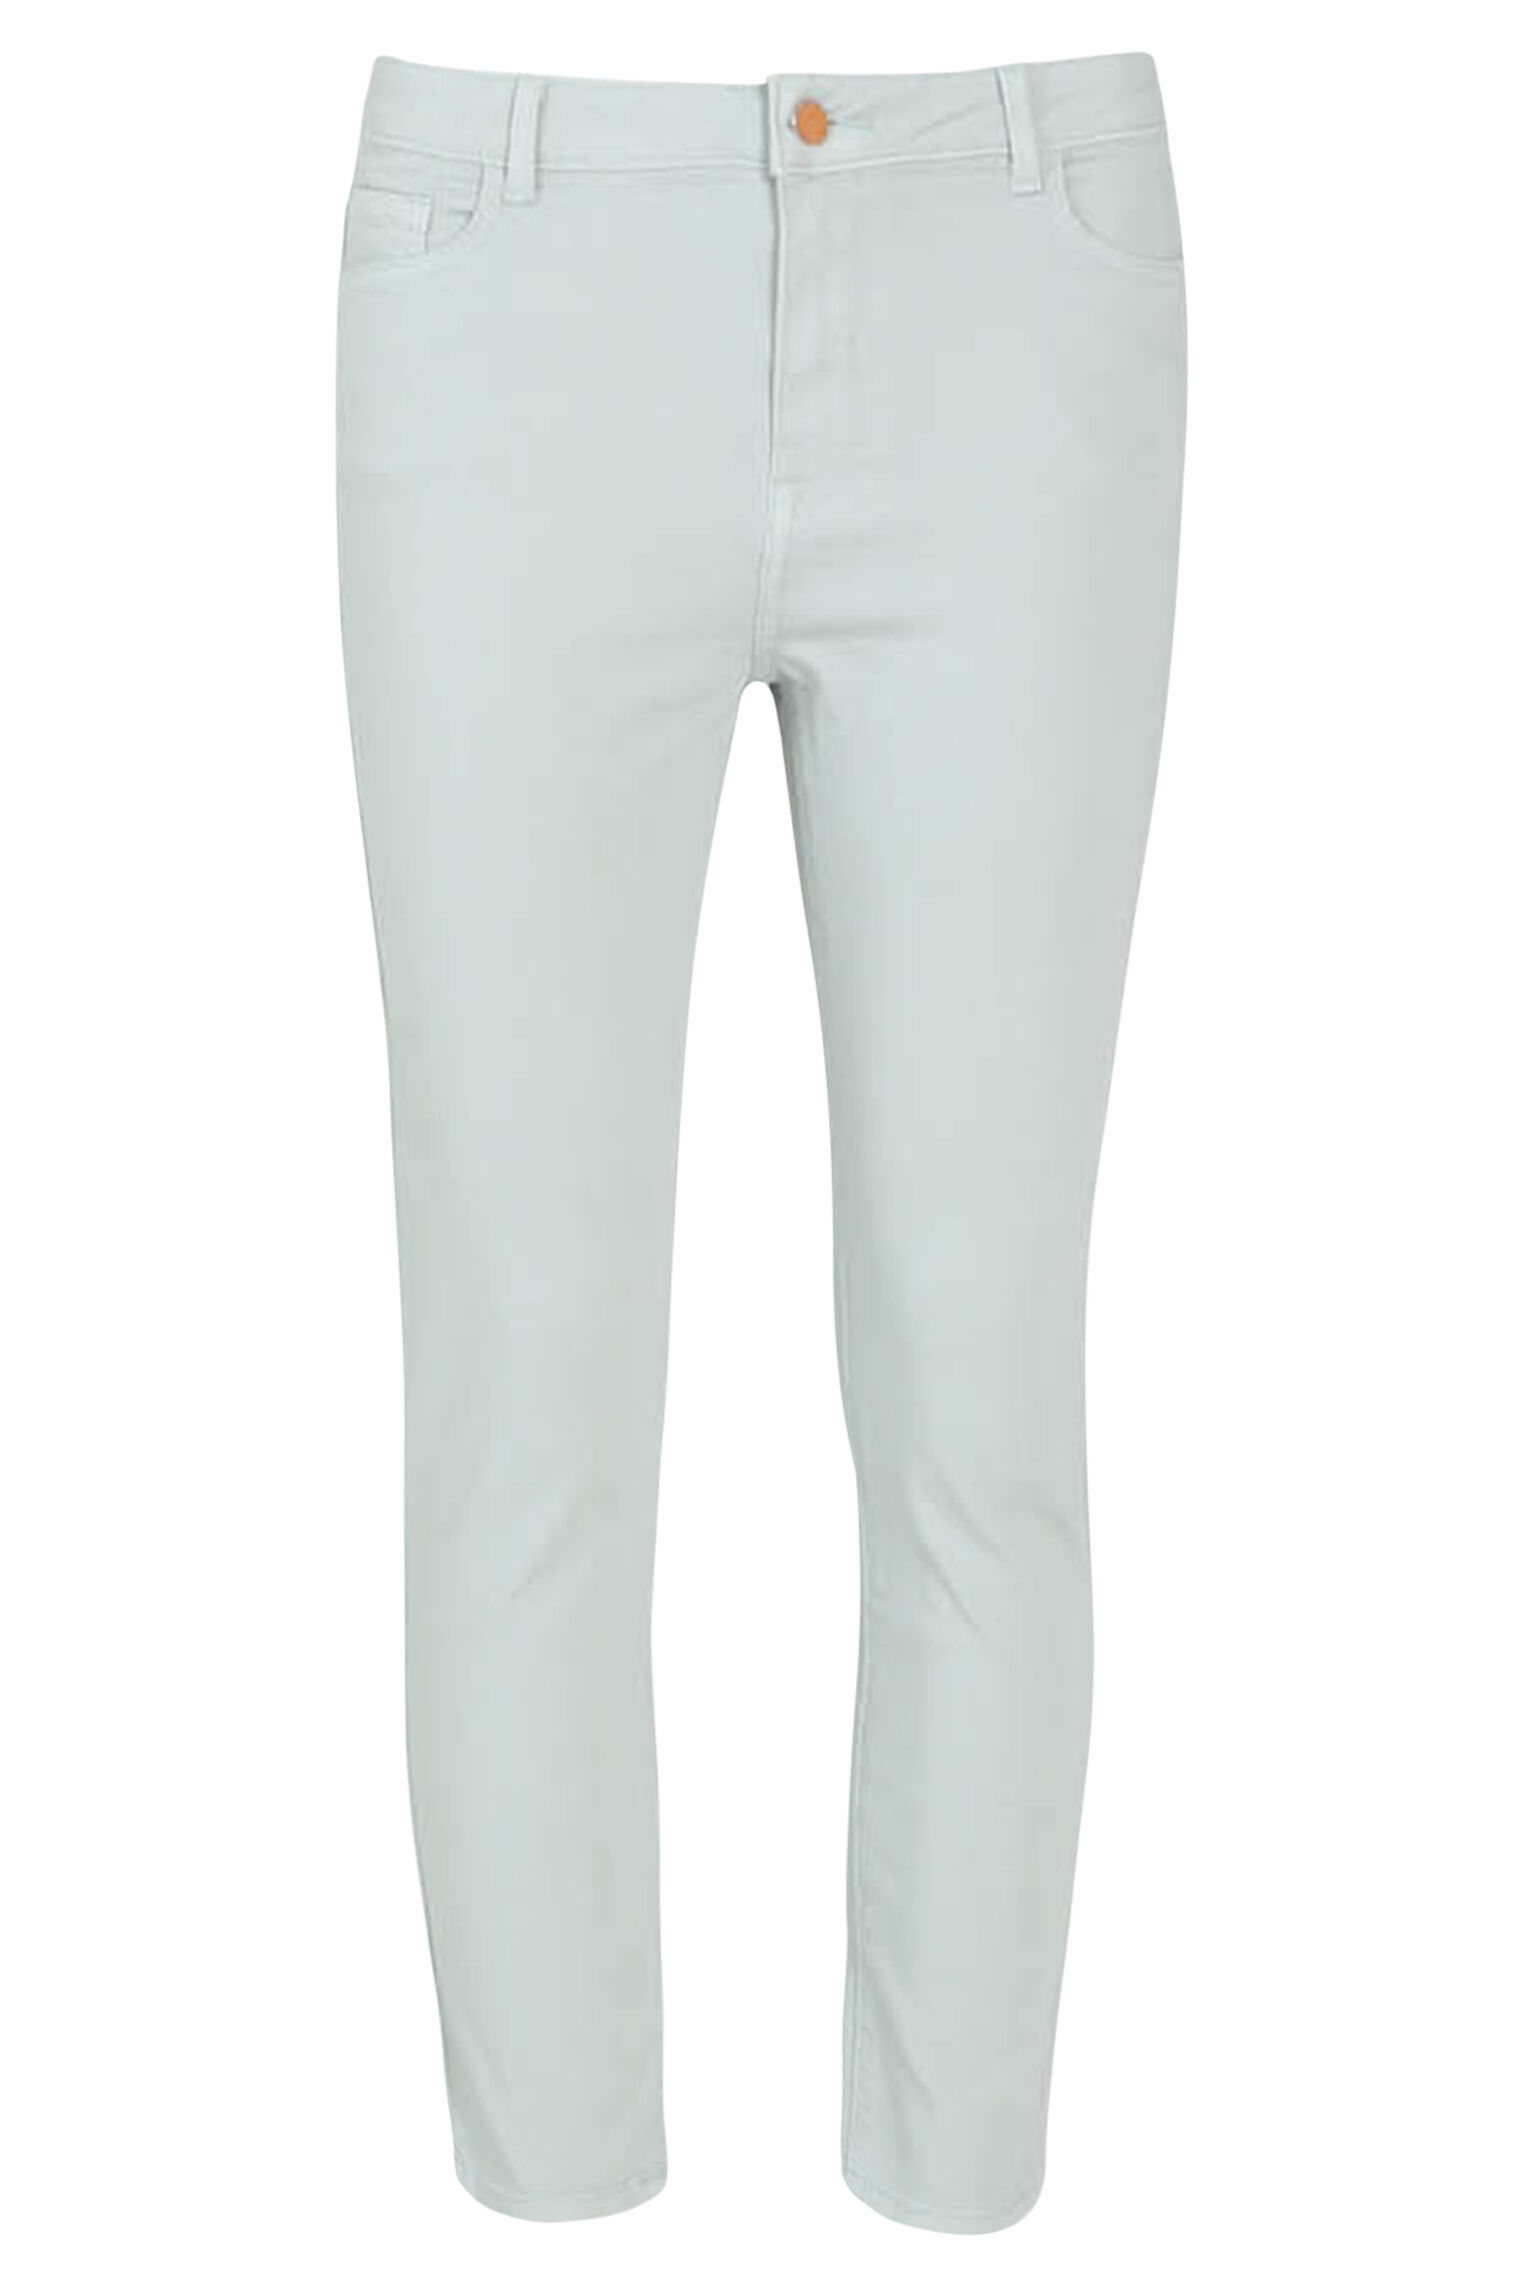 Cassis Pantalon Slim